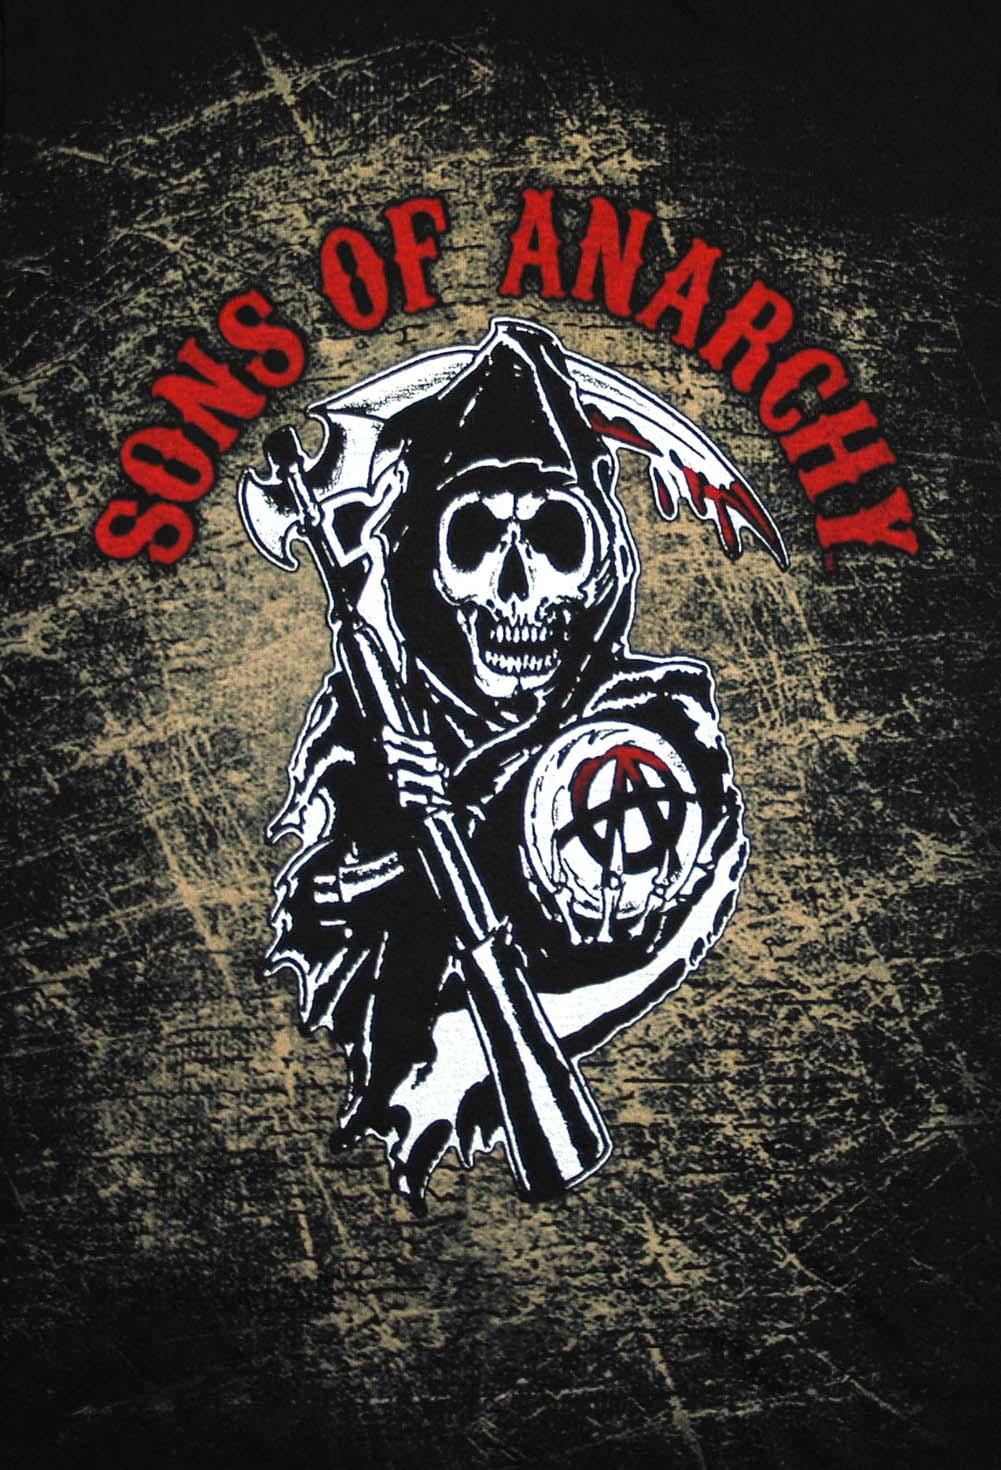 45 Sons Of Anarchy Logo Wallpaper On Wallpapersafari